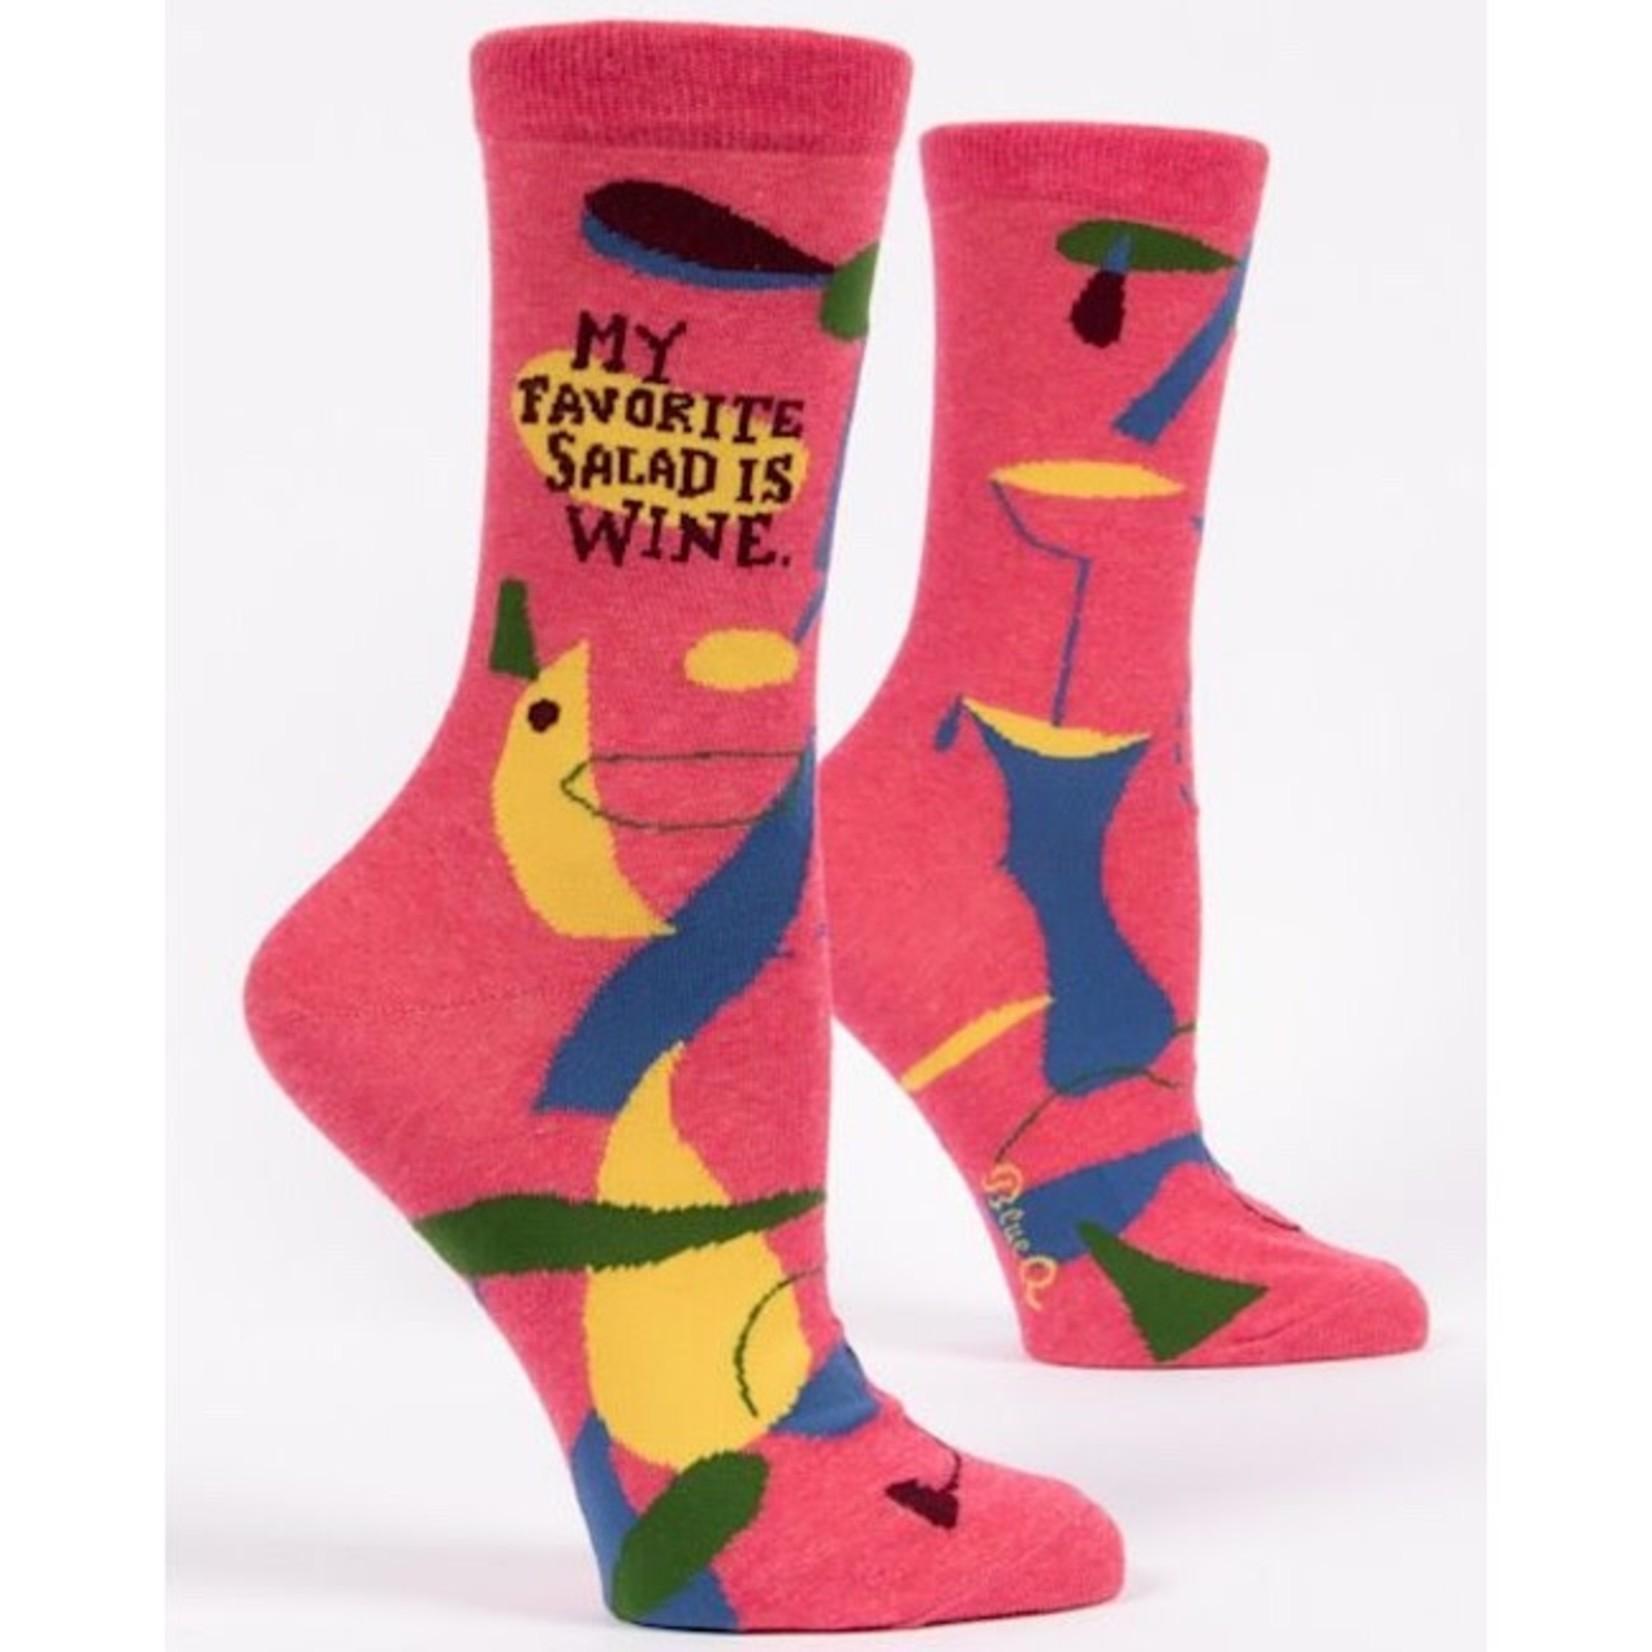 Socks (Womens) - My Favorite Salad Is Wine